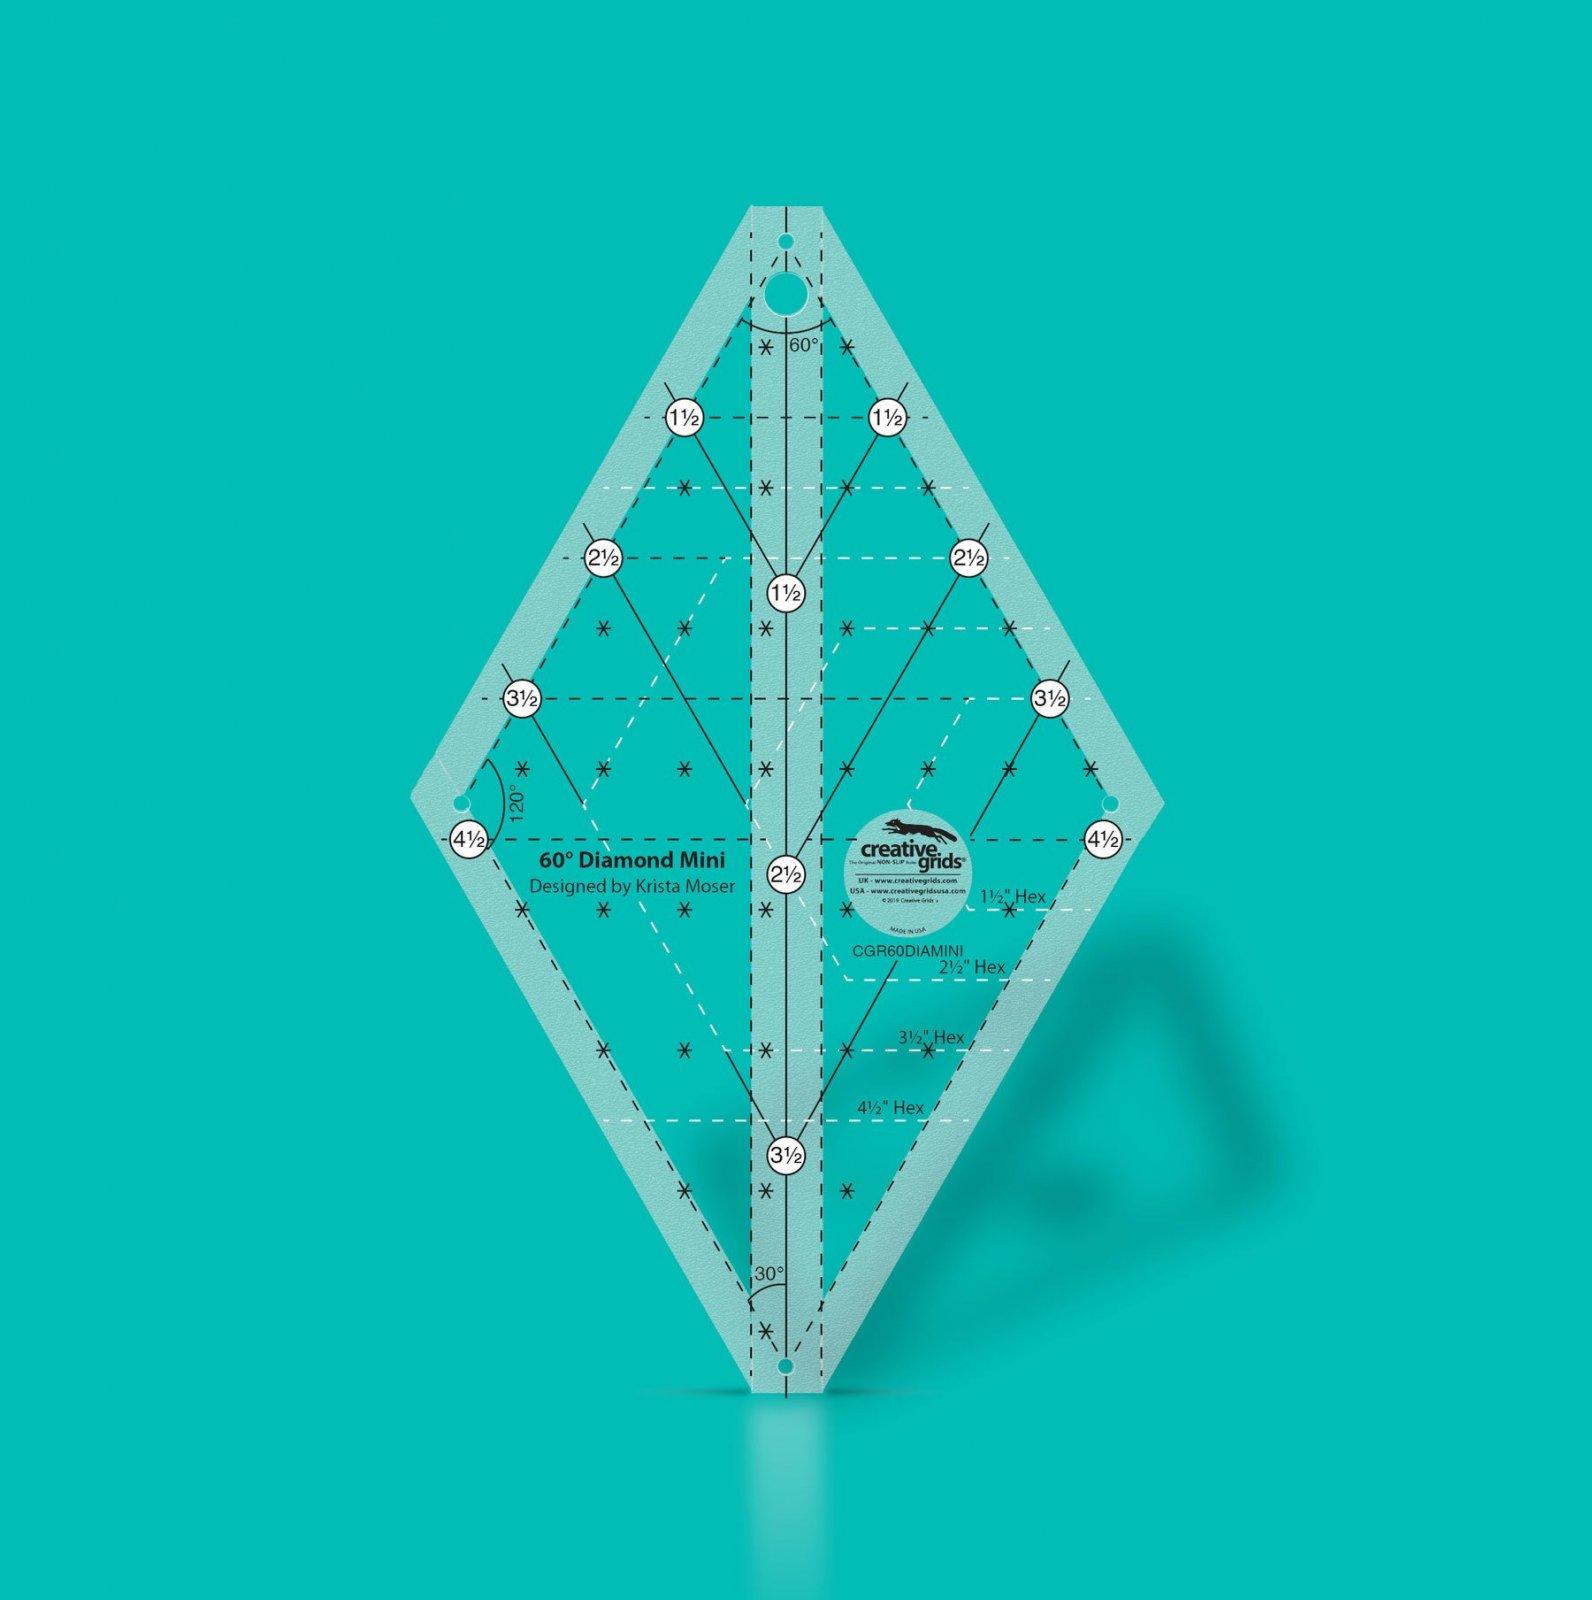 Creative Grids 60 Degree Mini Diamond Ruler | SKU# CGR60DIAMINI